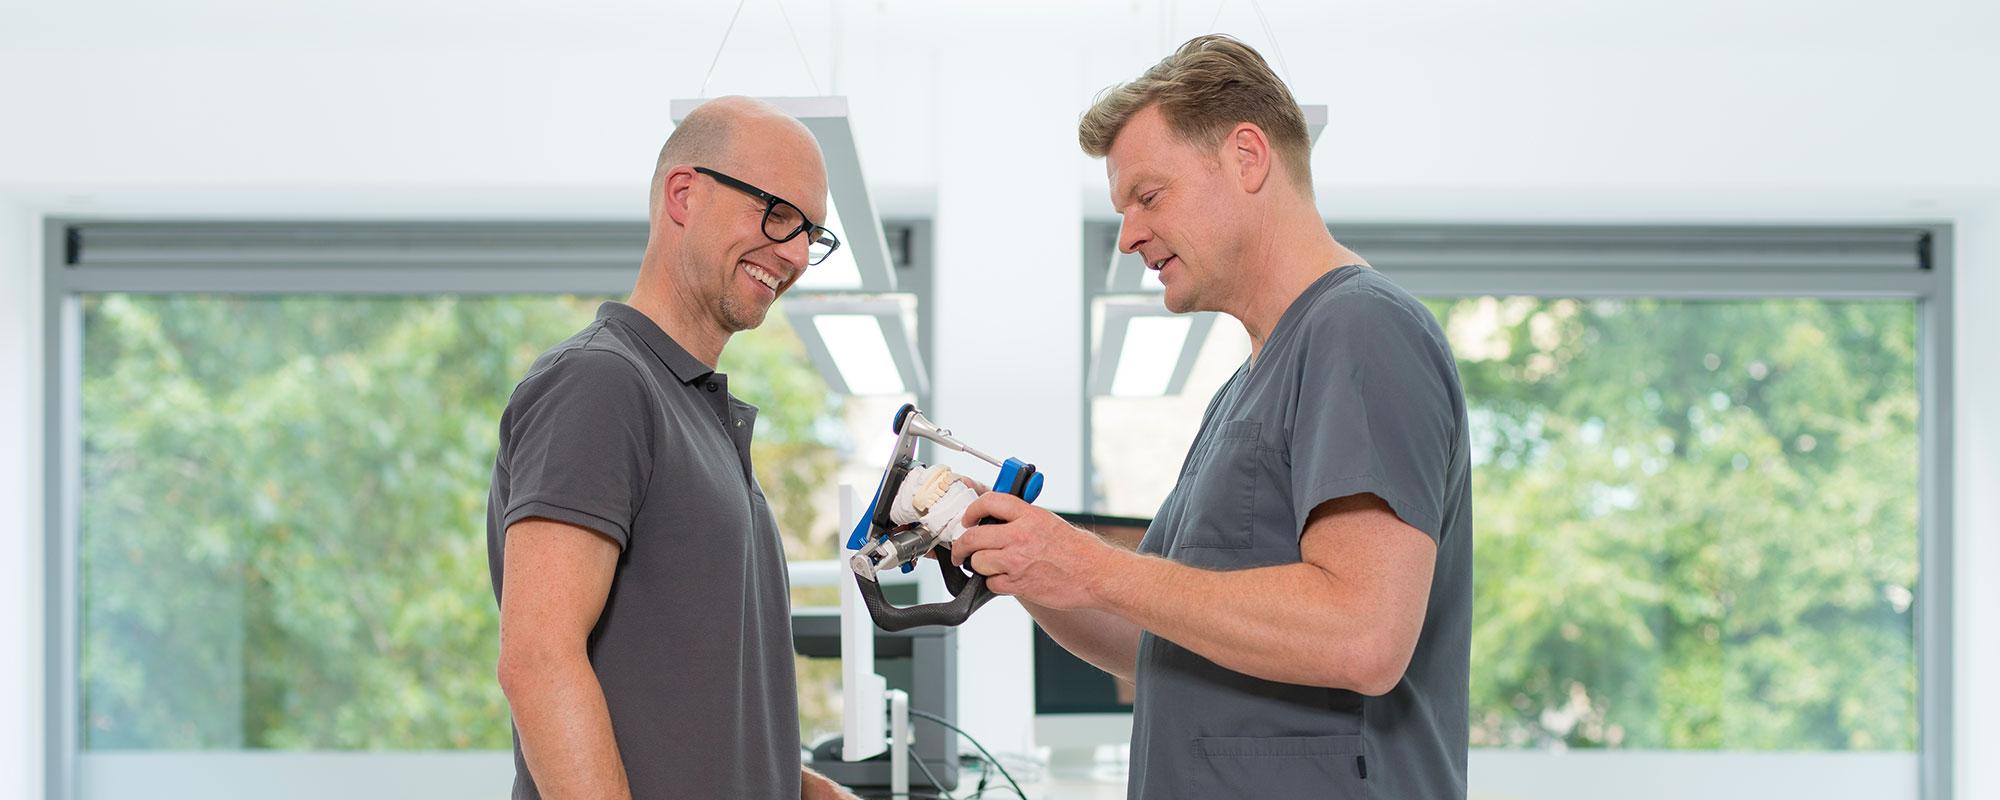 Smart Dental Technology